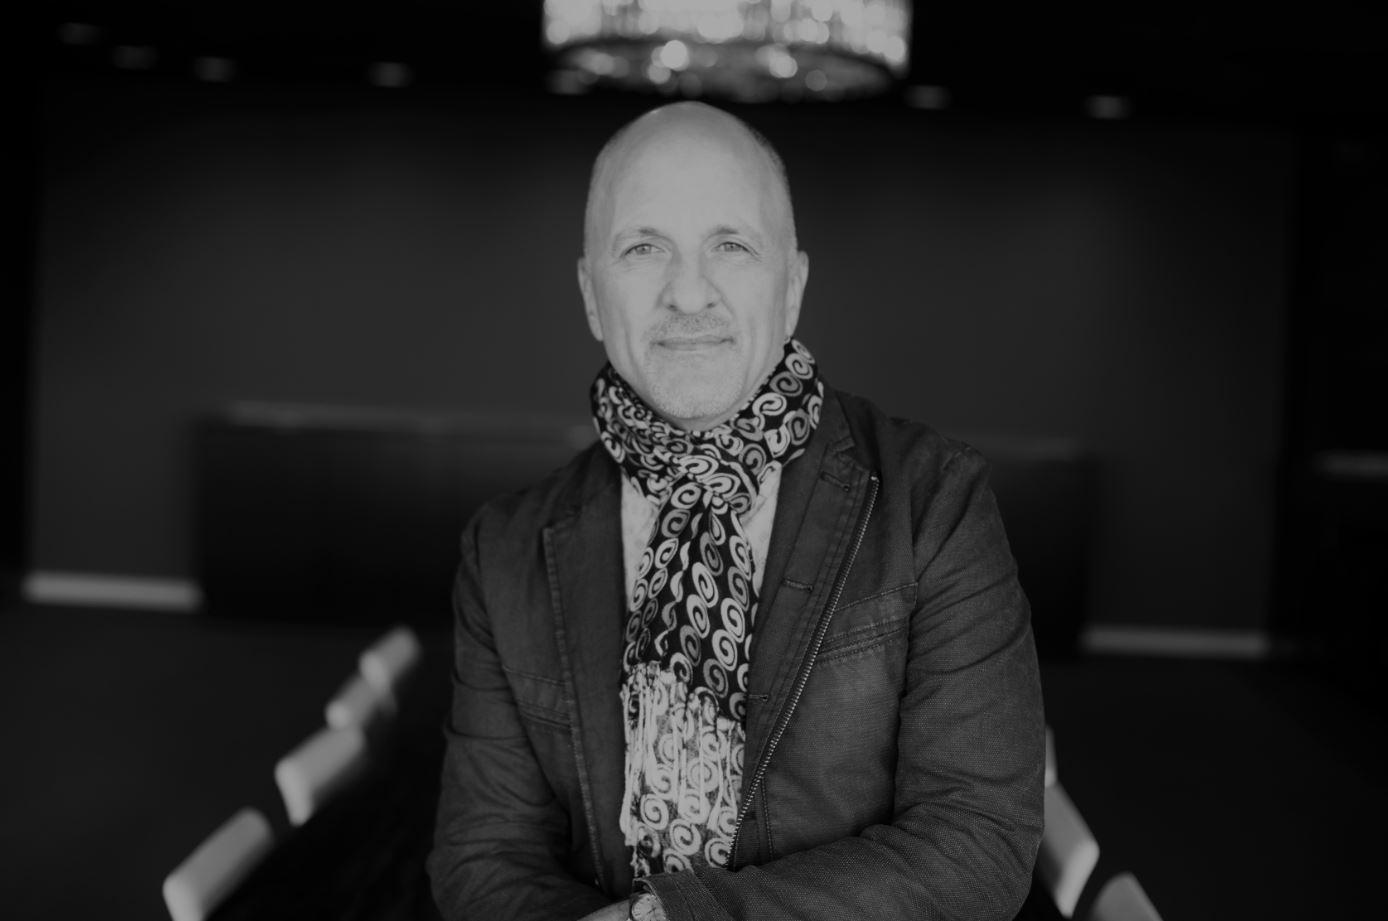 David Angelo